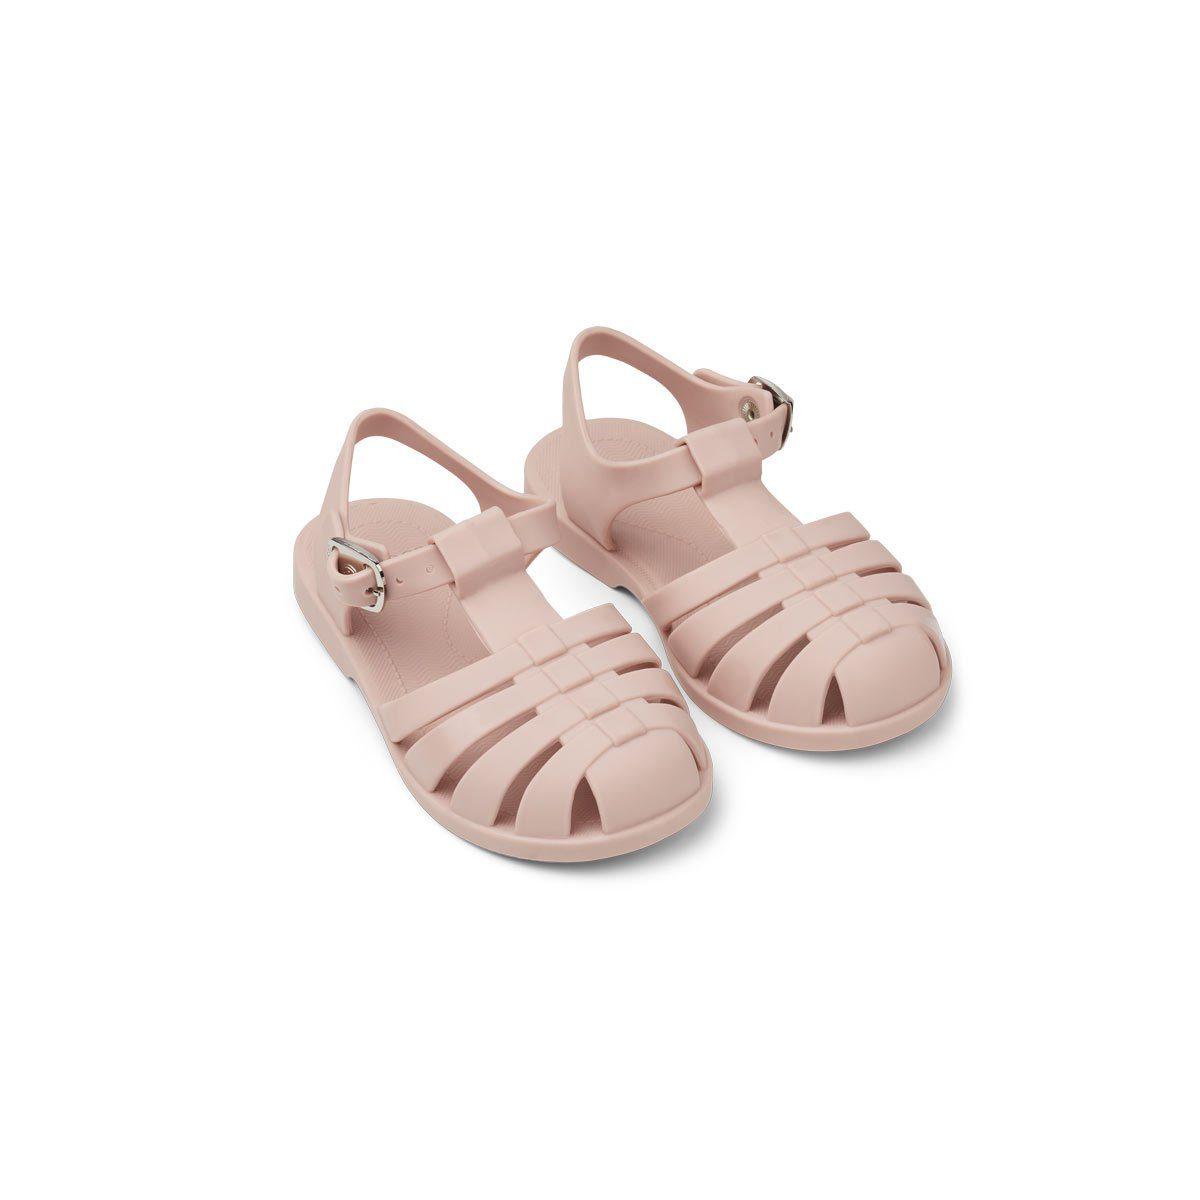 Baby \u0026 Kids Jelly Sandals Bre - Rose